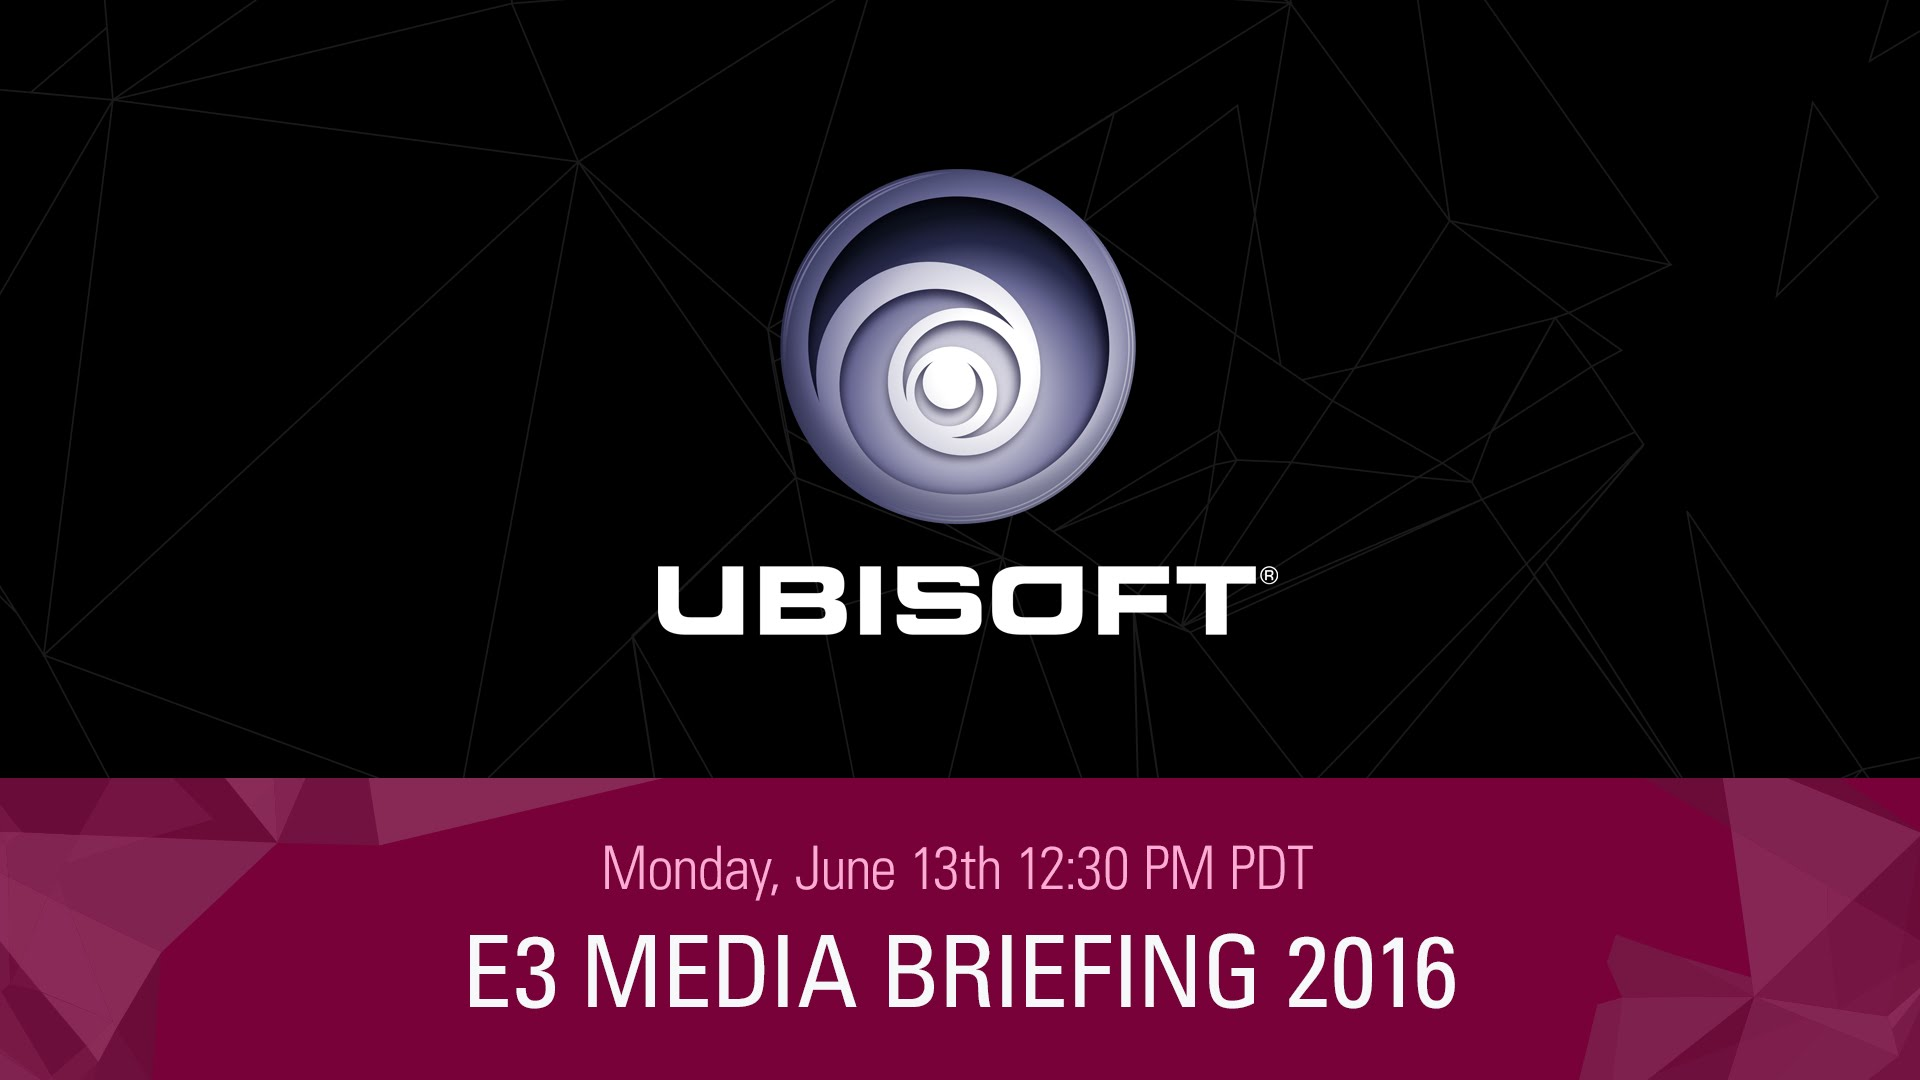 Playback Ubisoft's E3 Press Conference